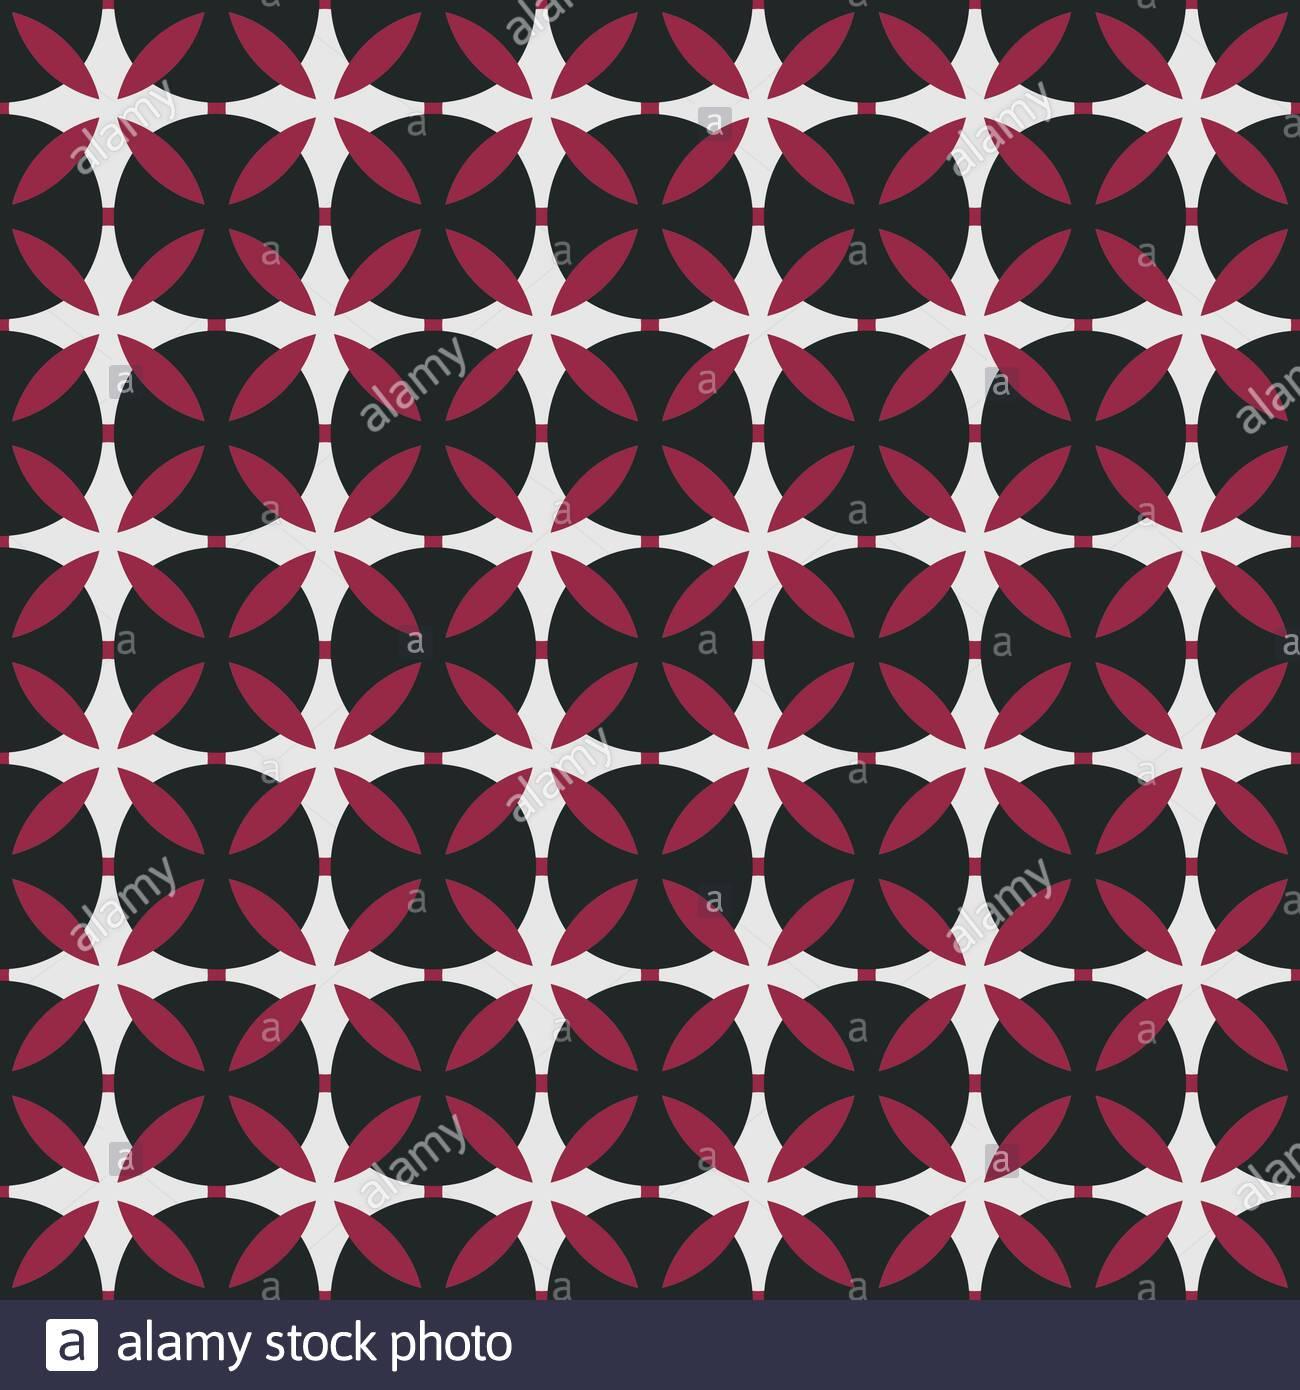 Repeatable Retro Geometric Pattern Fabric Print Design For